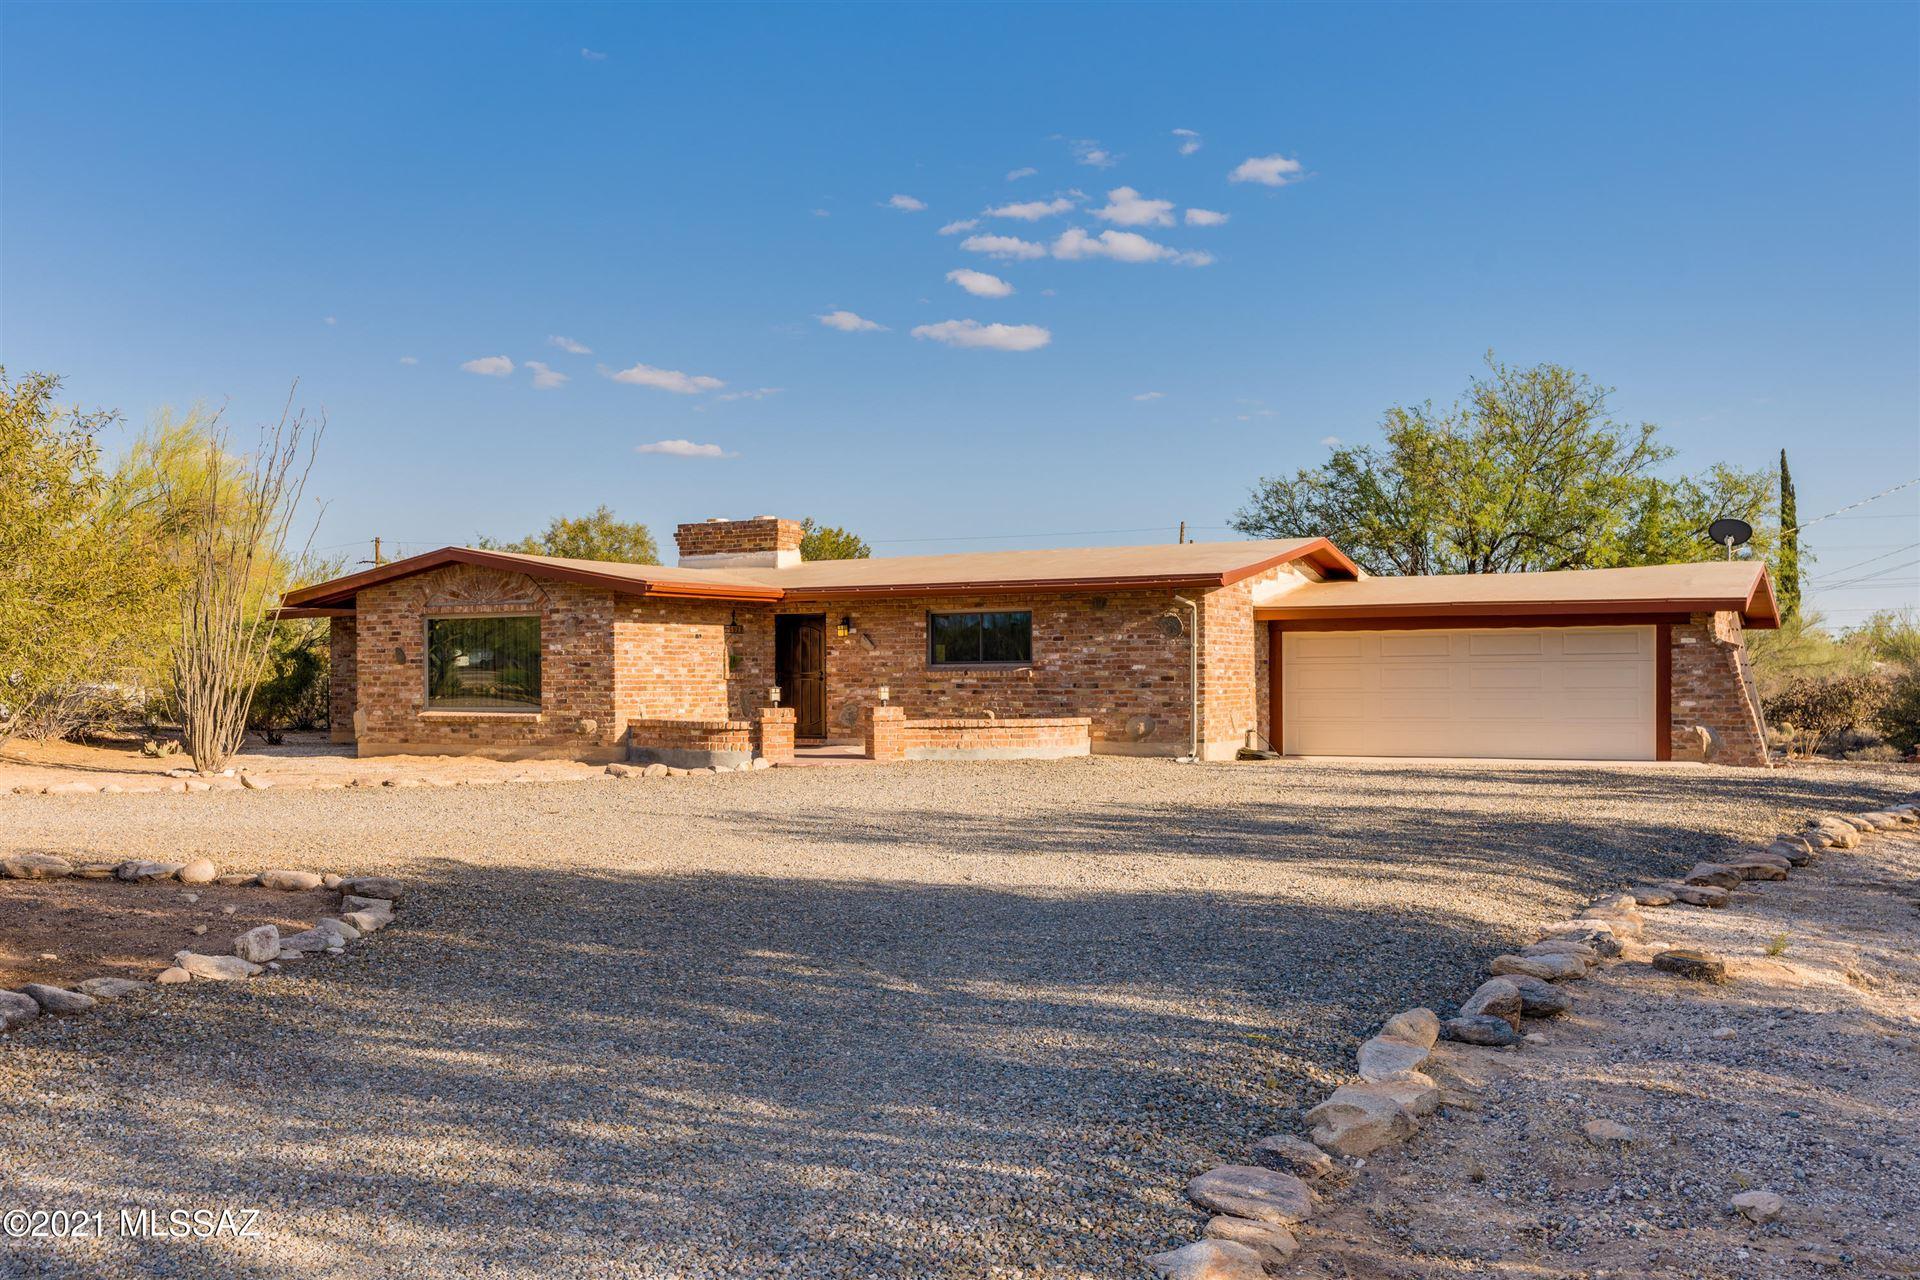 1029 W San Martin Drive, Tucson, AZ 85704 - MLS#: 22112866